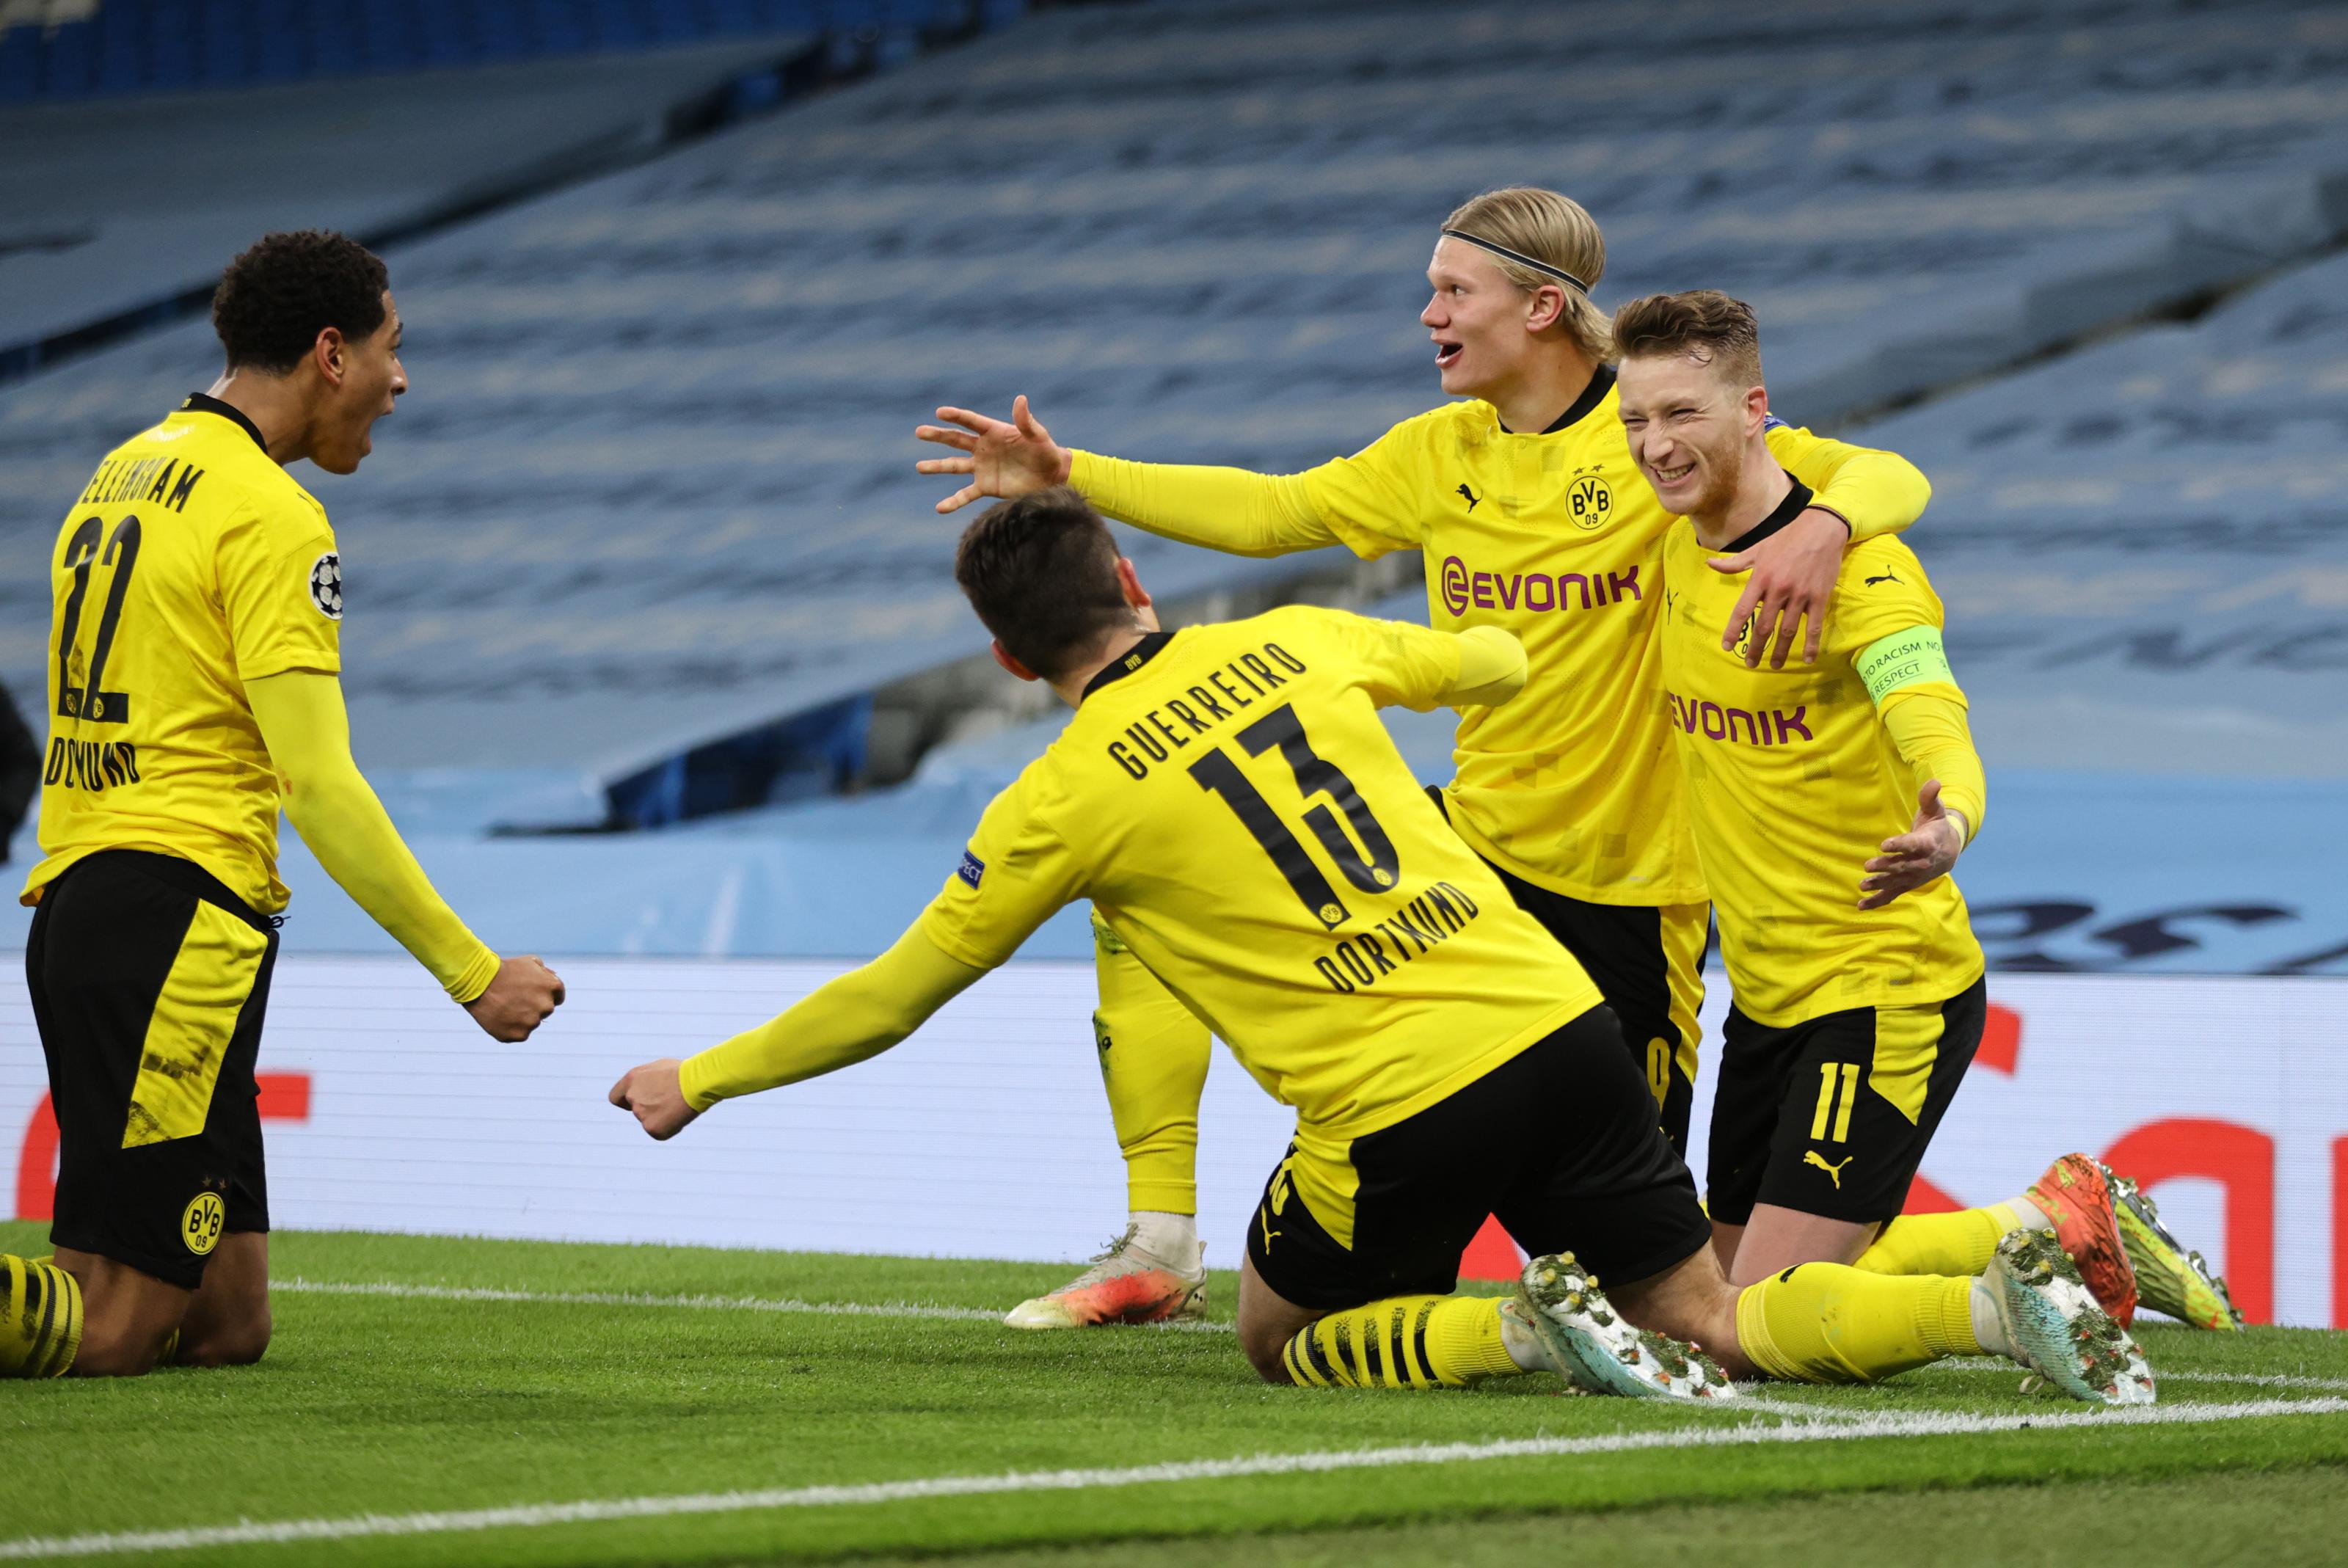 Stuttgart vs Borussia Dortmund: Prediction, Lineups, Team News, Betting Tips & Match Previews